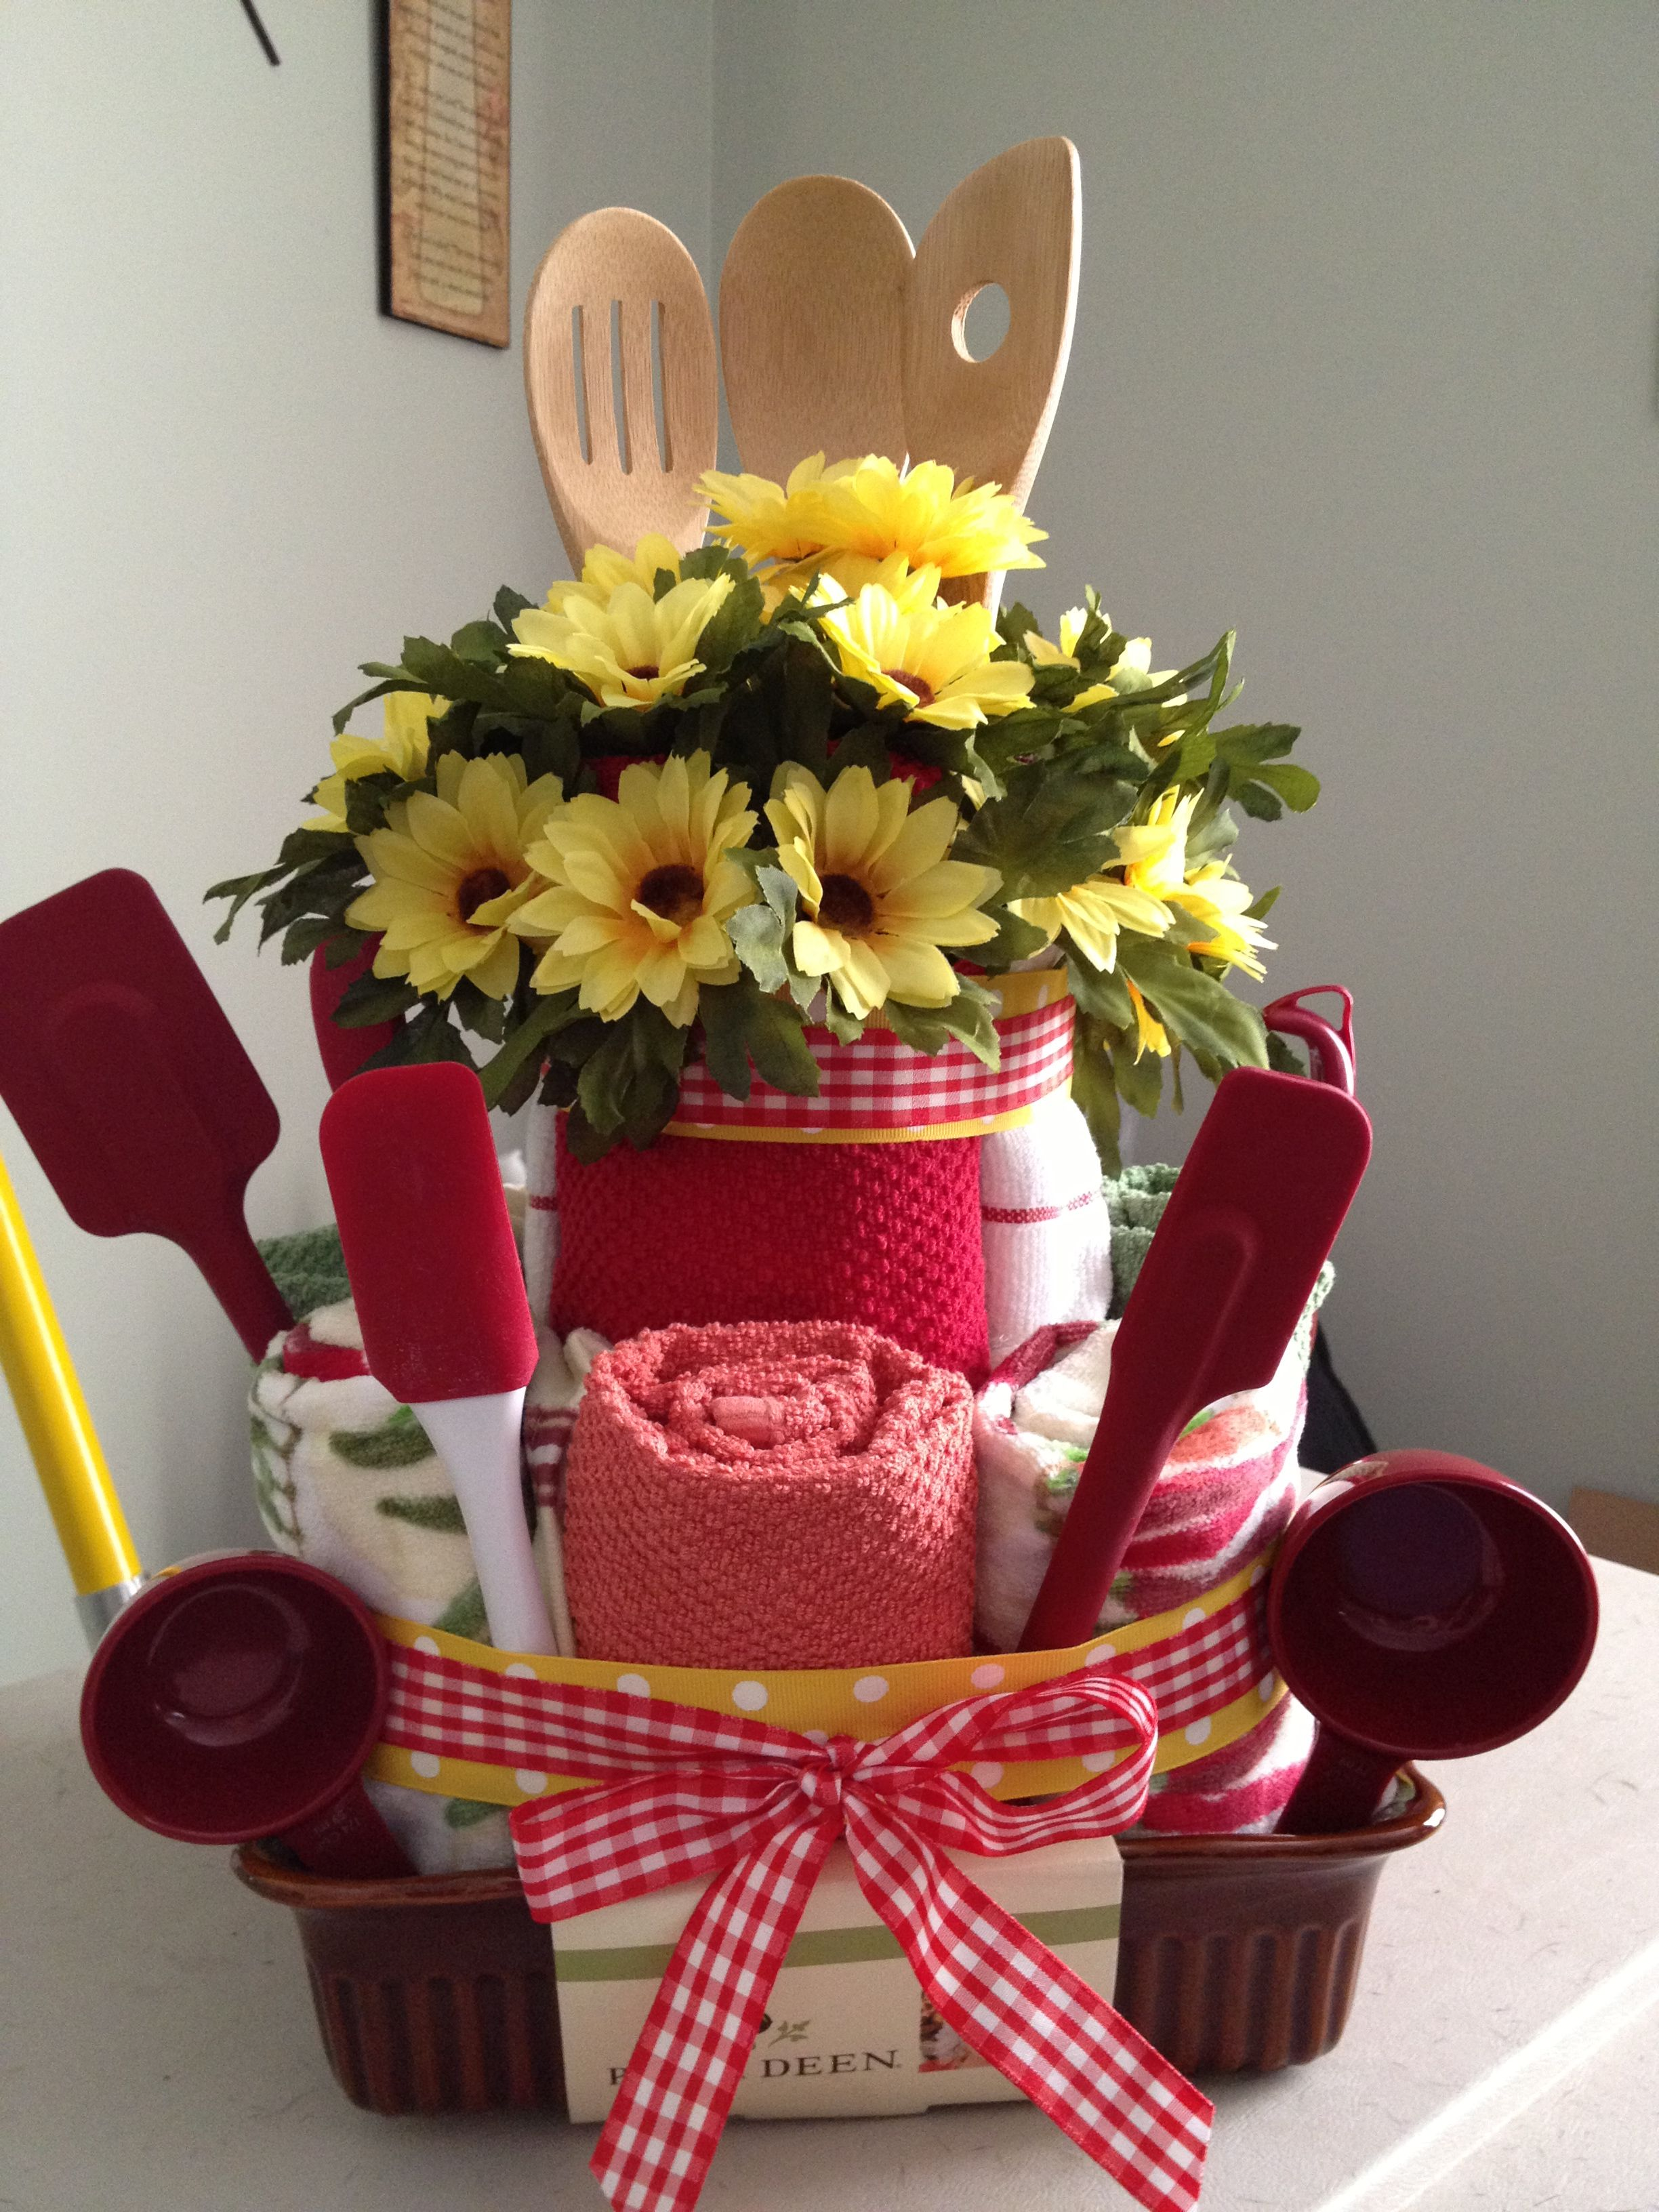 Kitchen Wedding Gifts: Kitchen Towel Cake For Bridal Shower